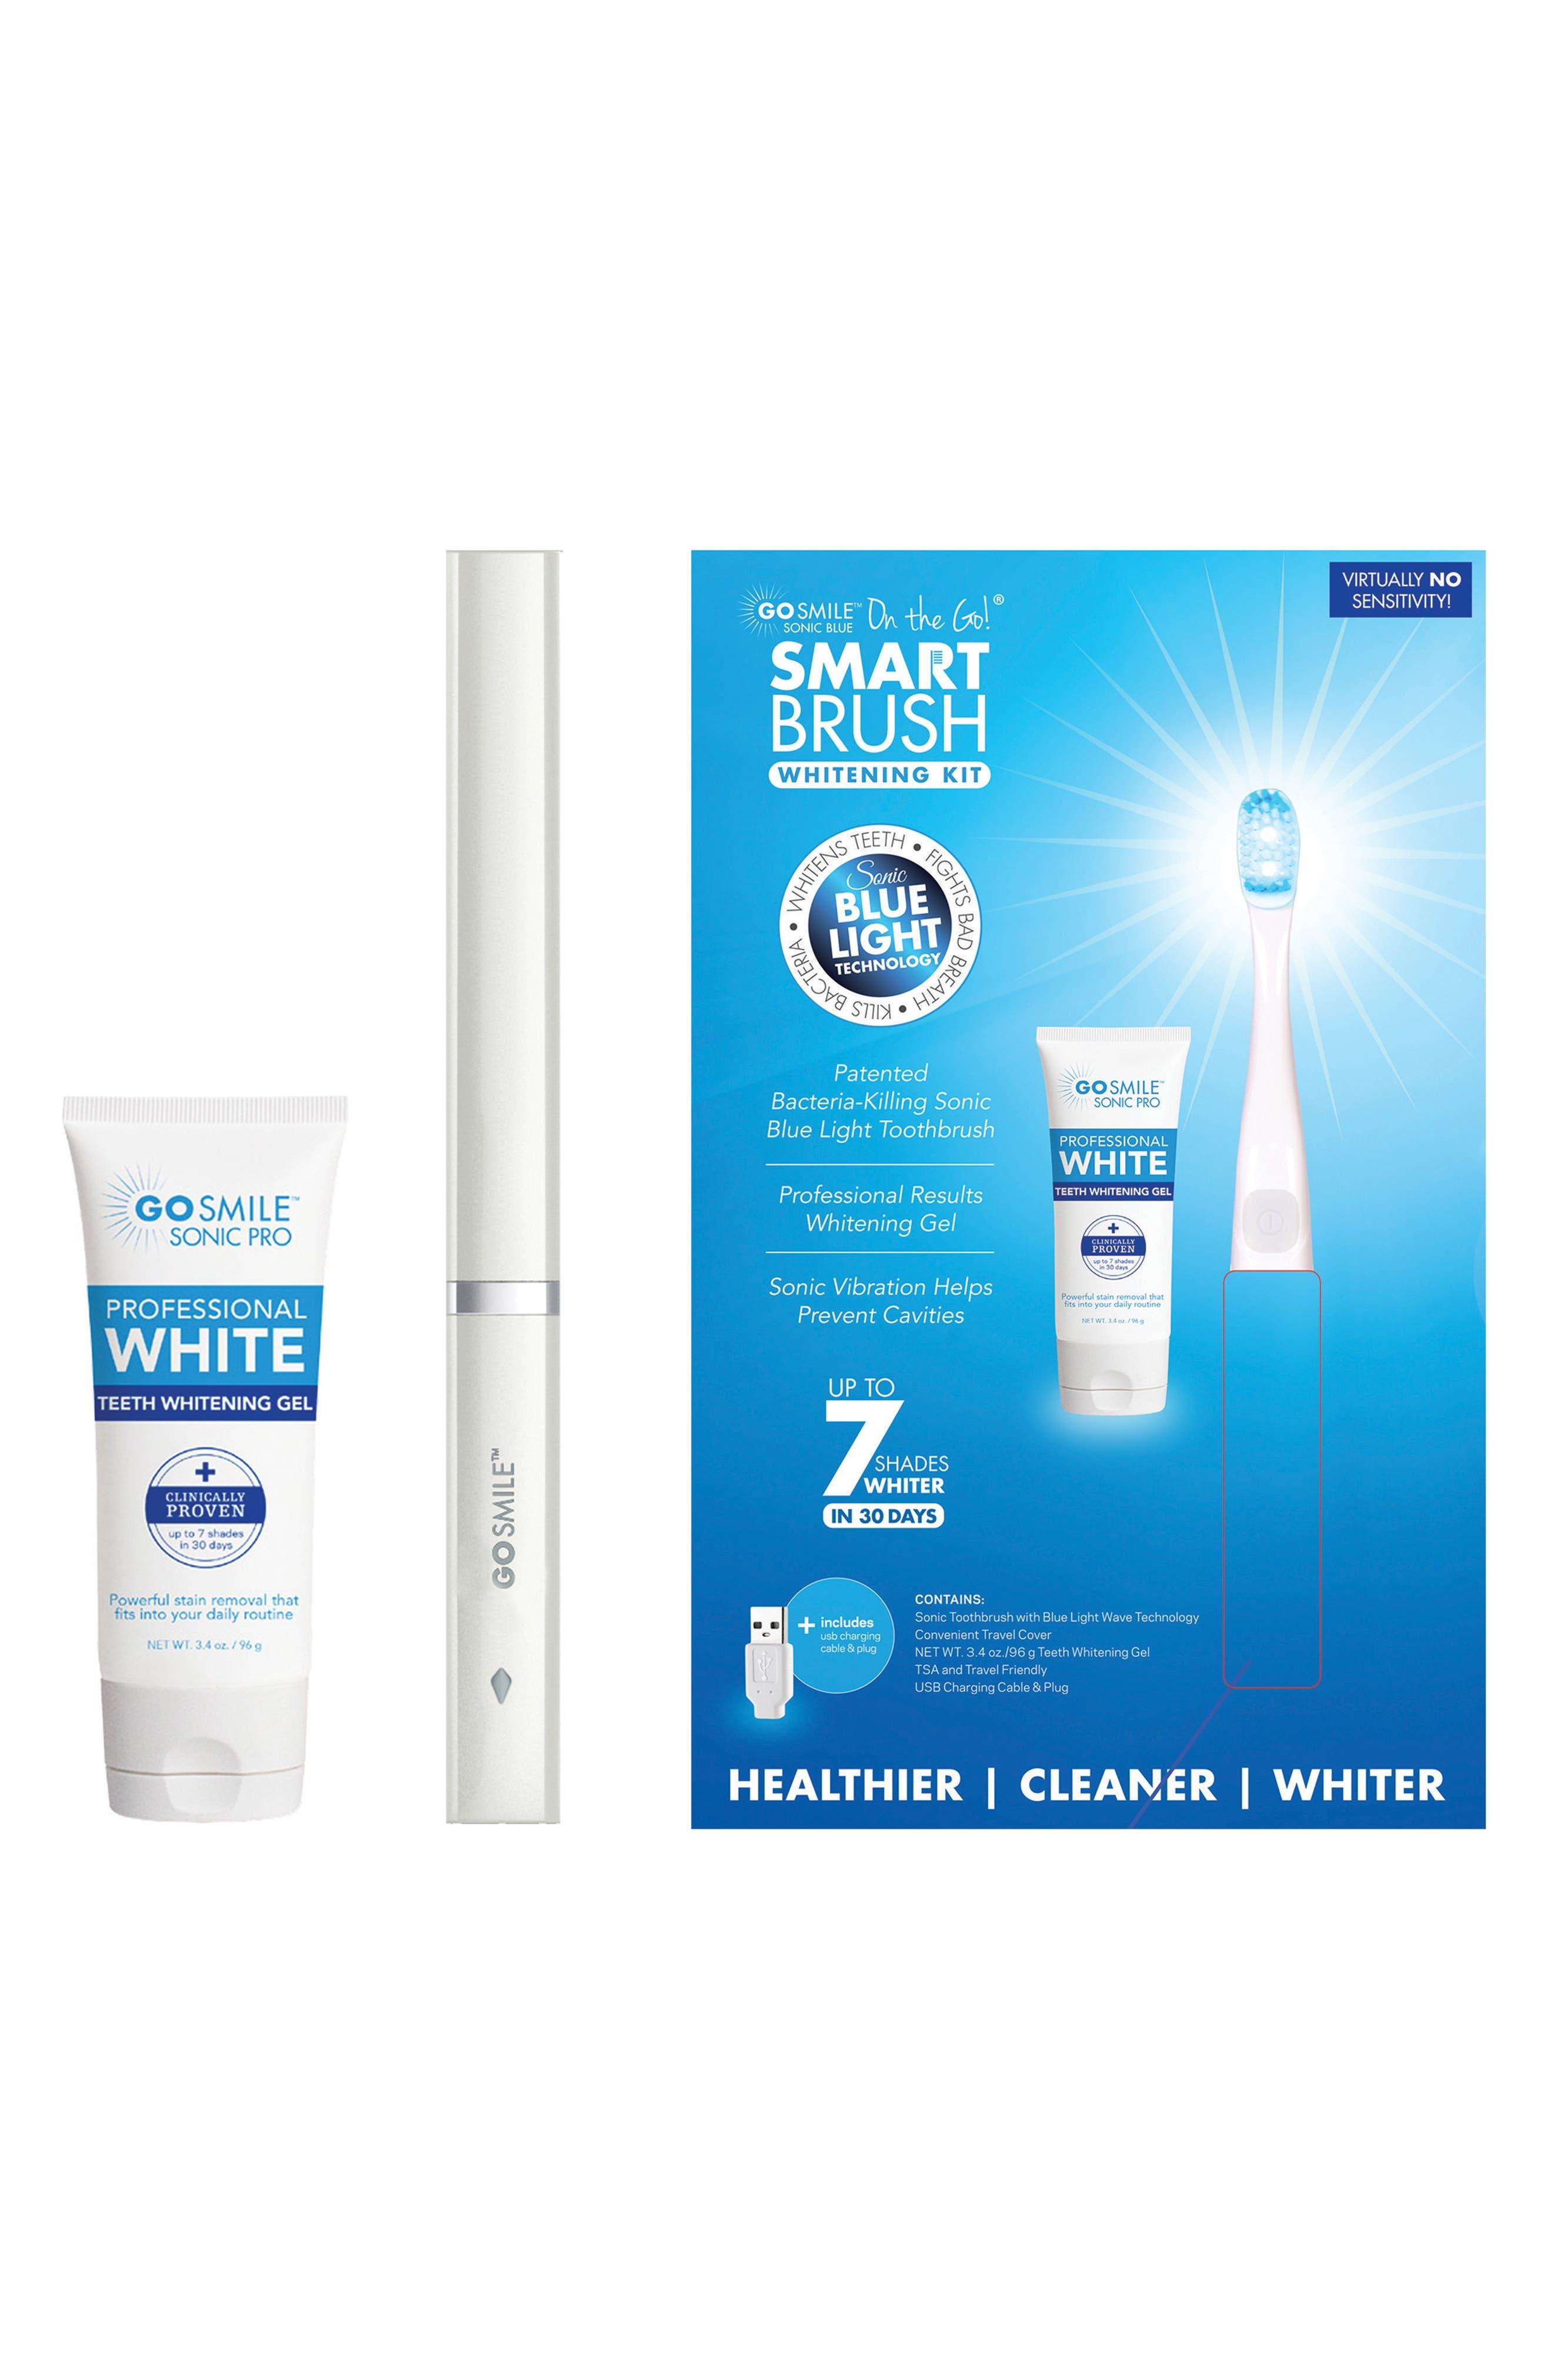 GO SMiLE® 'Dental Pro On-the-Go - Sonic Blue' Teeth Whitening System